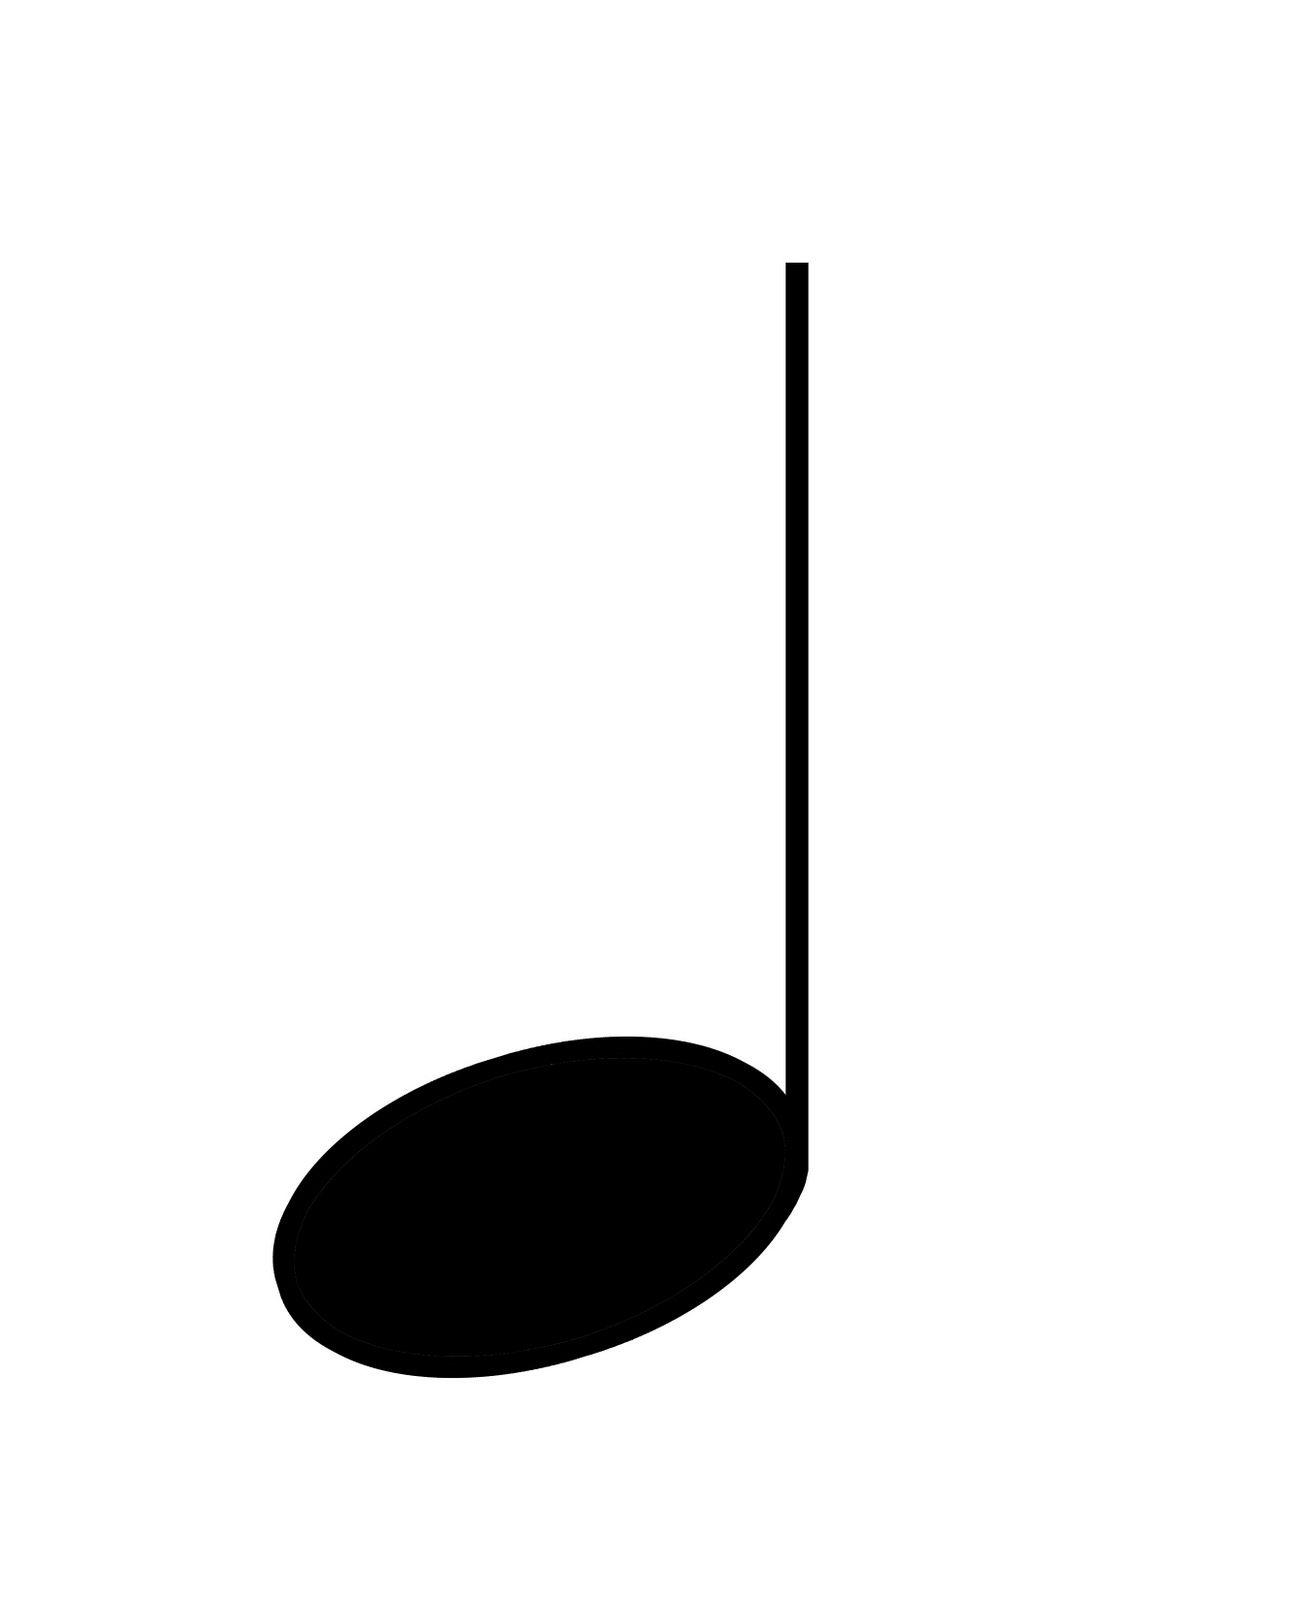 Quarter Note Clip Art - Cliparts. | Music | Pinterest | Clip art ...